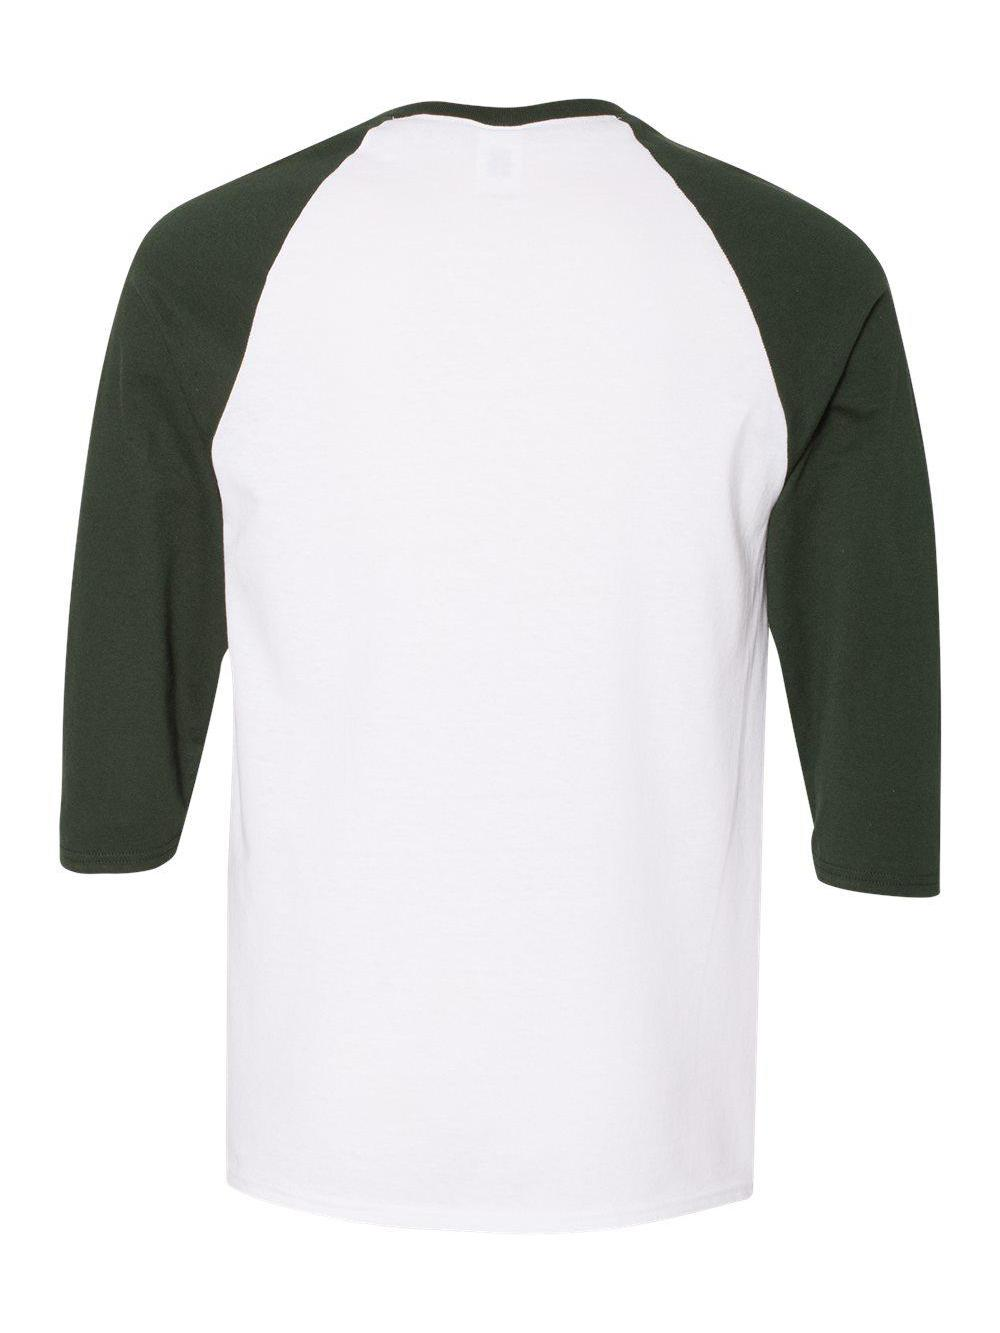 Gildan-Heavy-Cotton-Three-Quarter-Raglan-Sleeve-Baseball-T-Shirt-5700 thumbnail 25